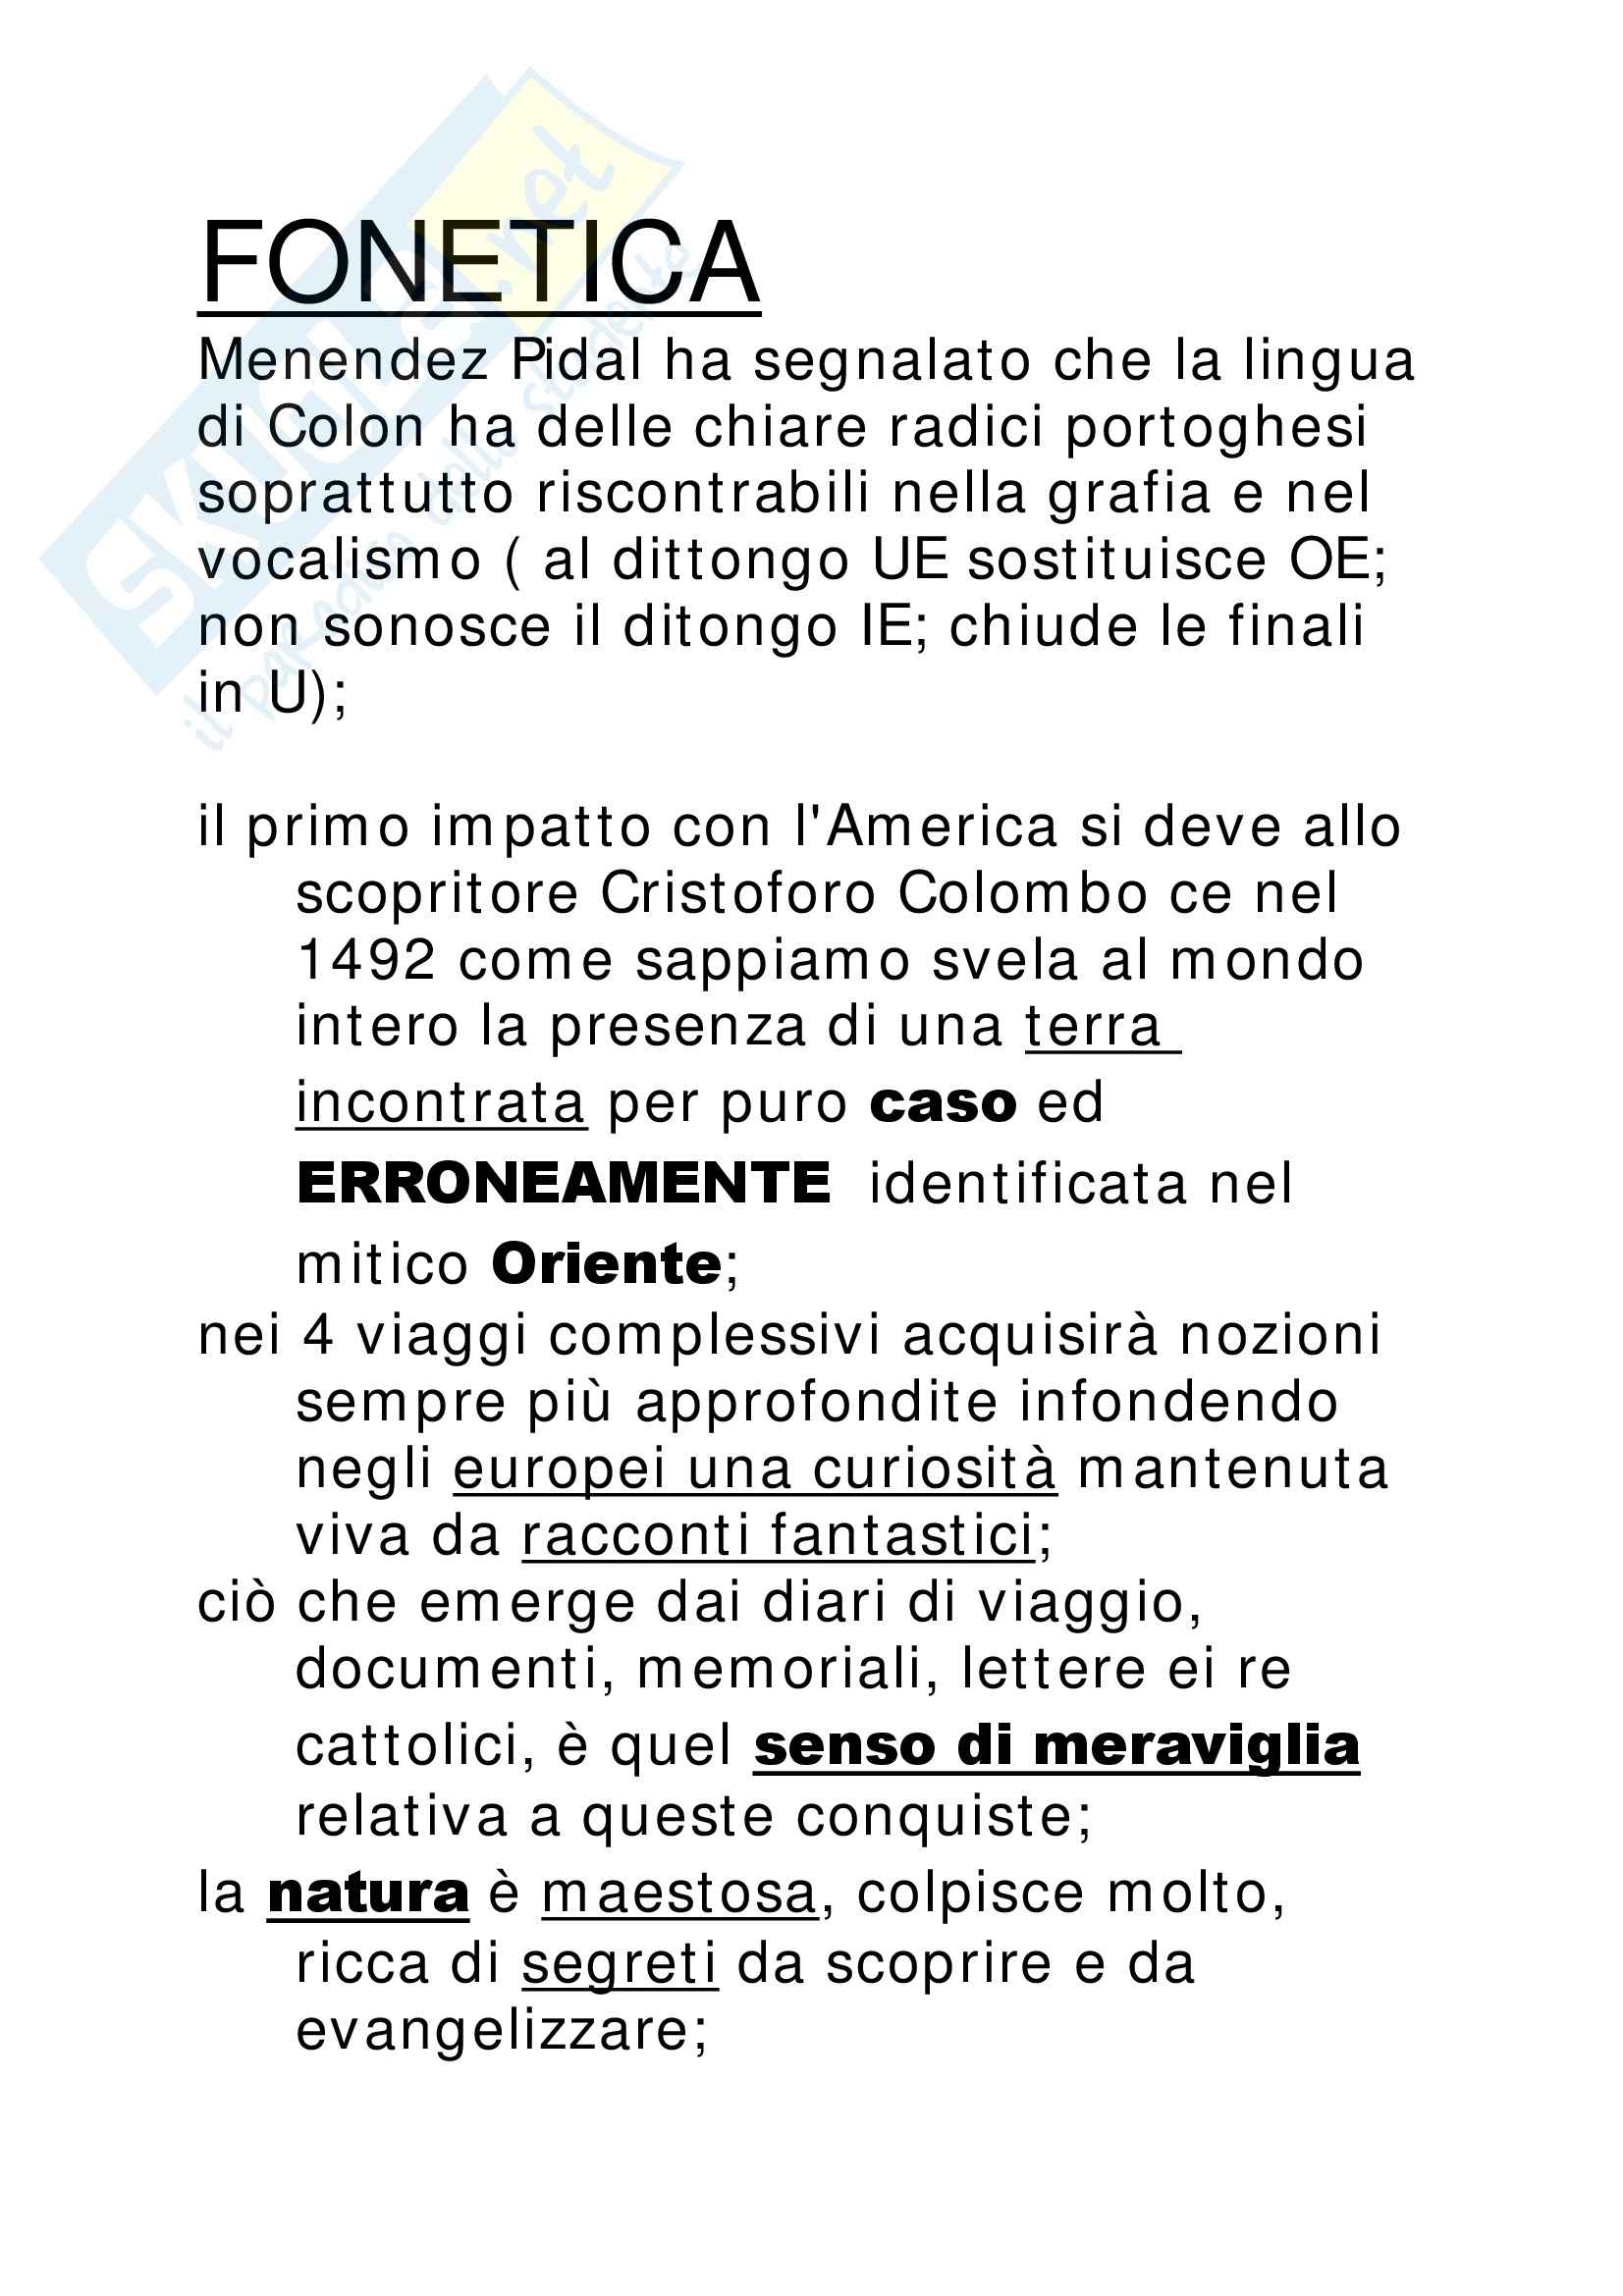 Cristoforo Colombo - Appunti Pag. 6